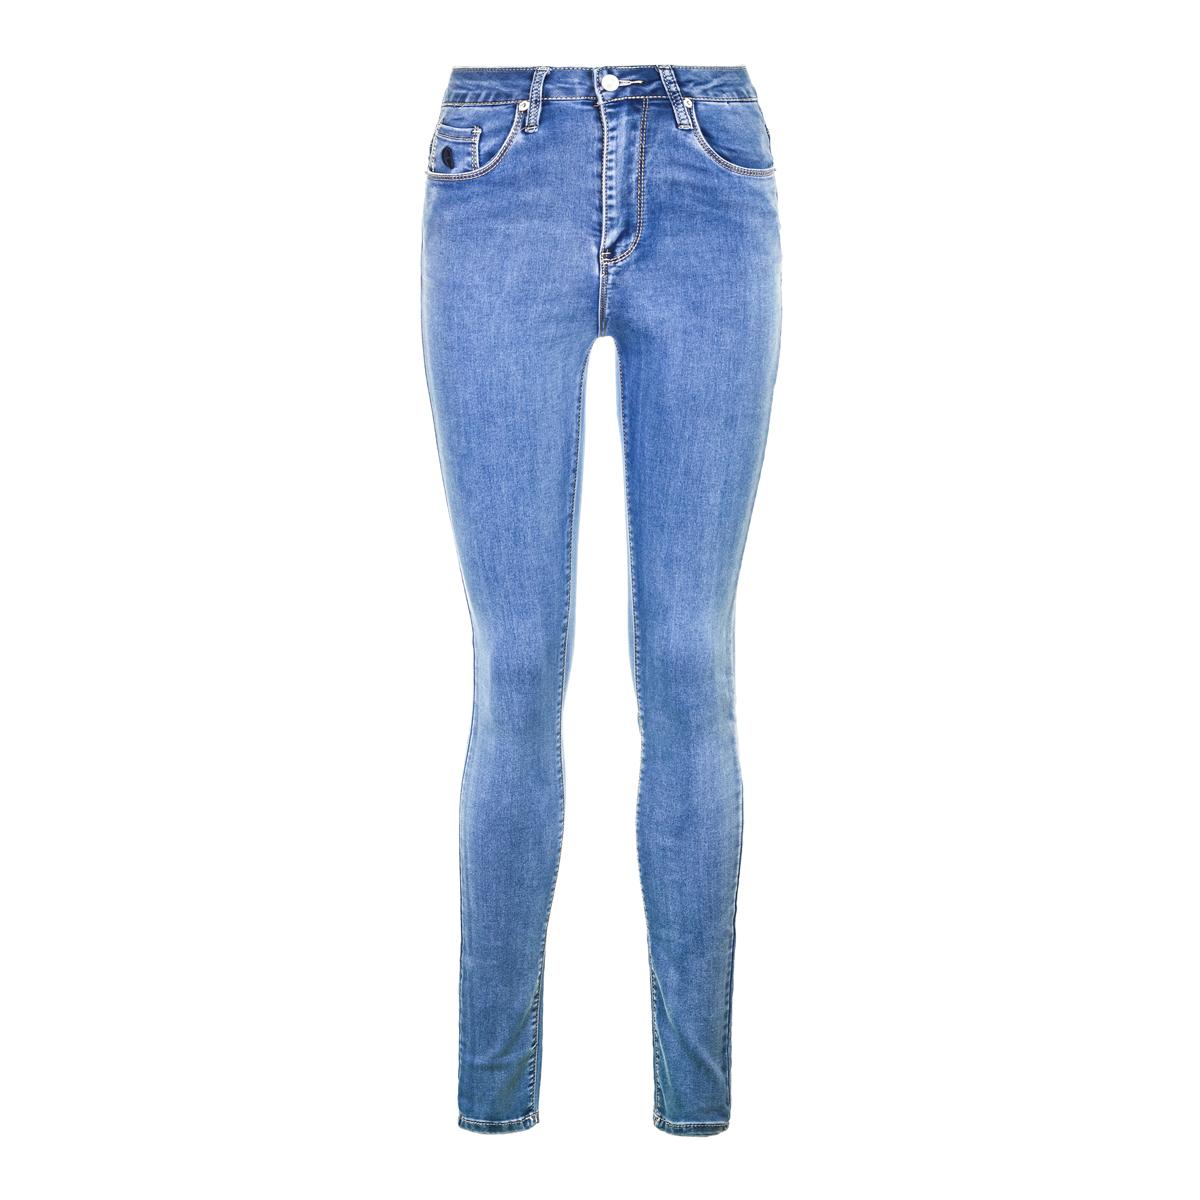 Жен. джинсы арт. 12-0086 Голубой р. 25 фото